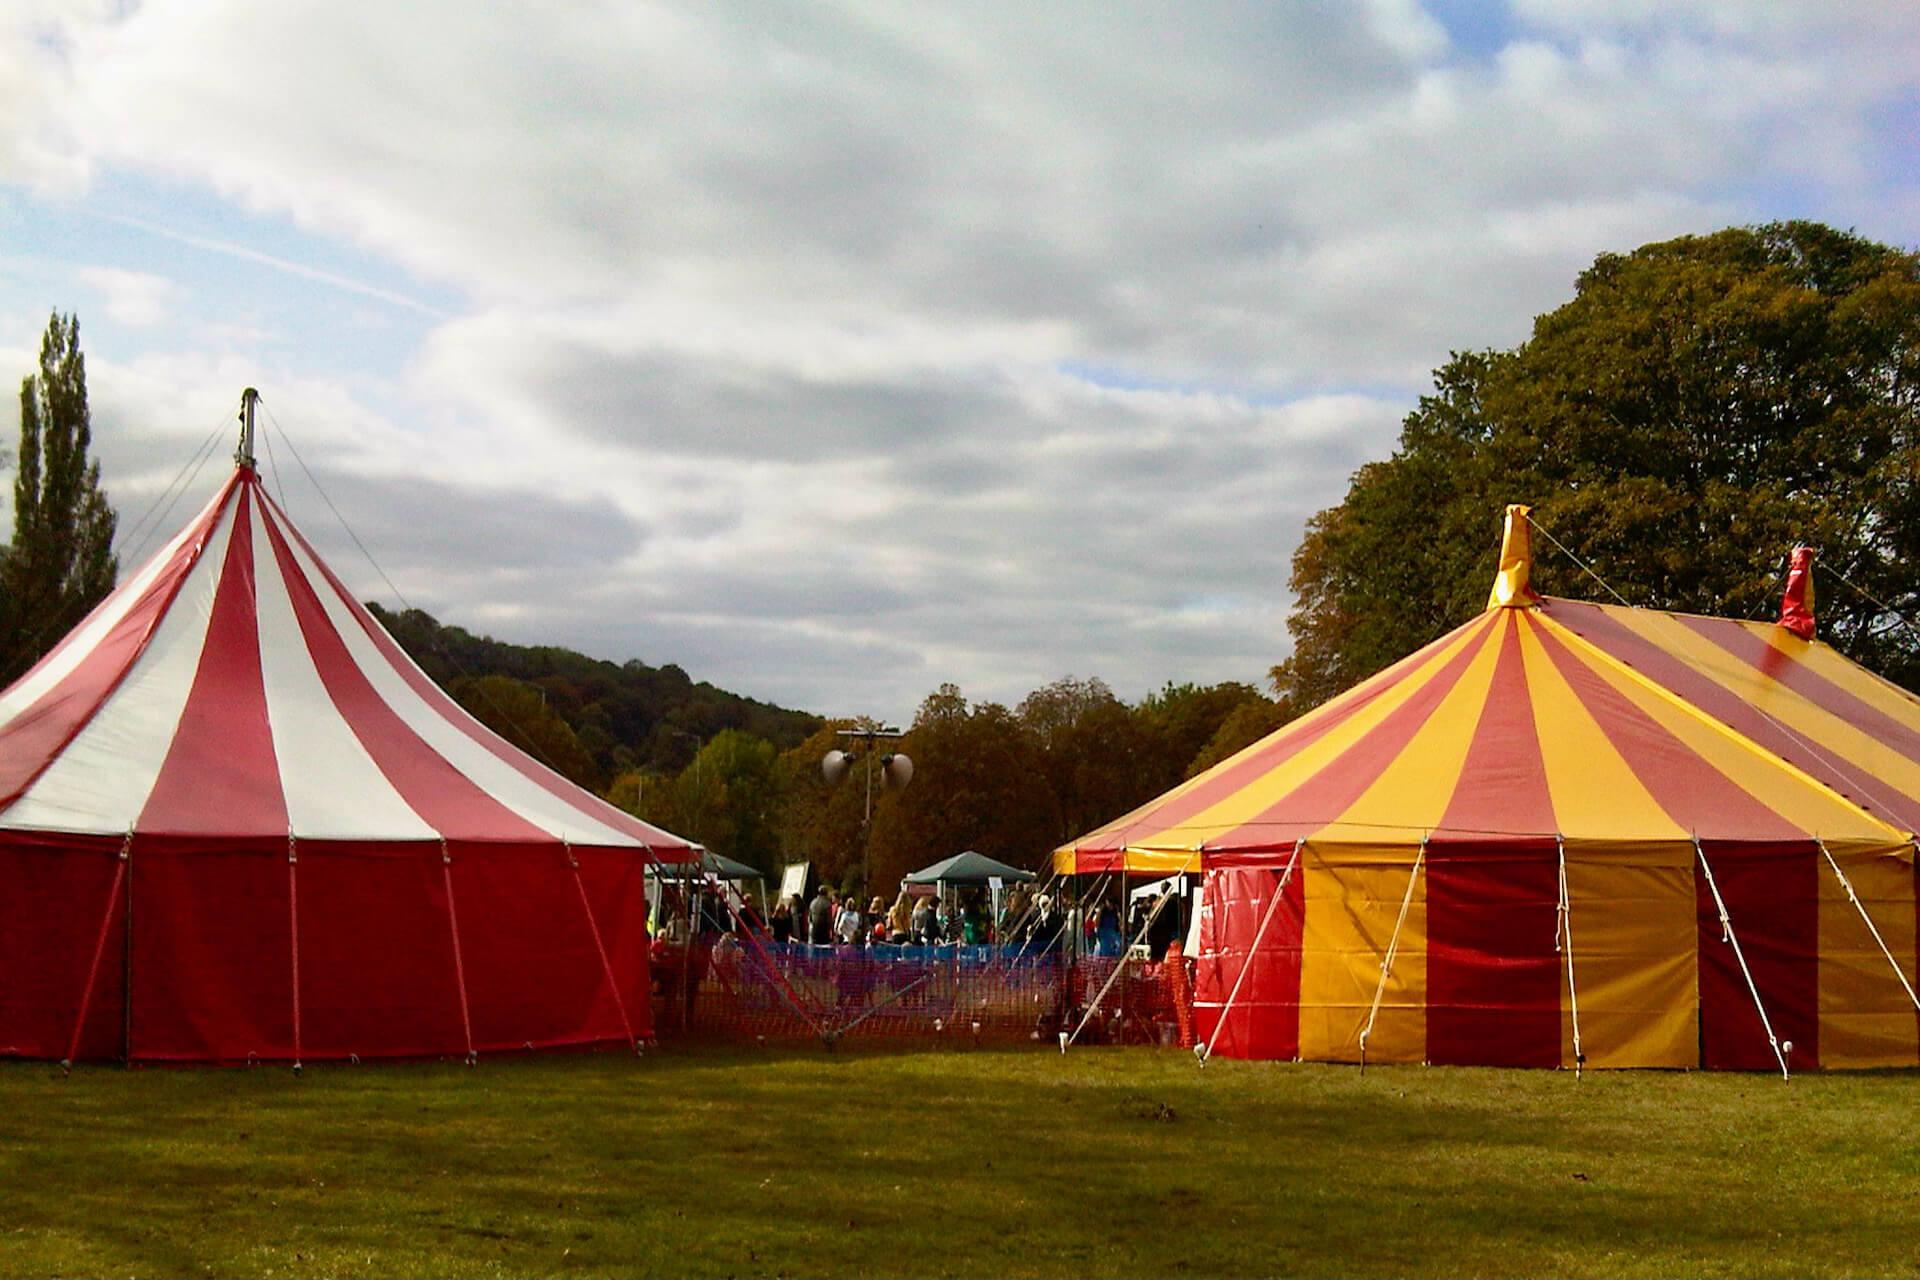 Colourful big top circus tents